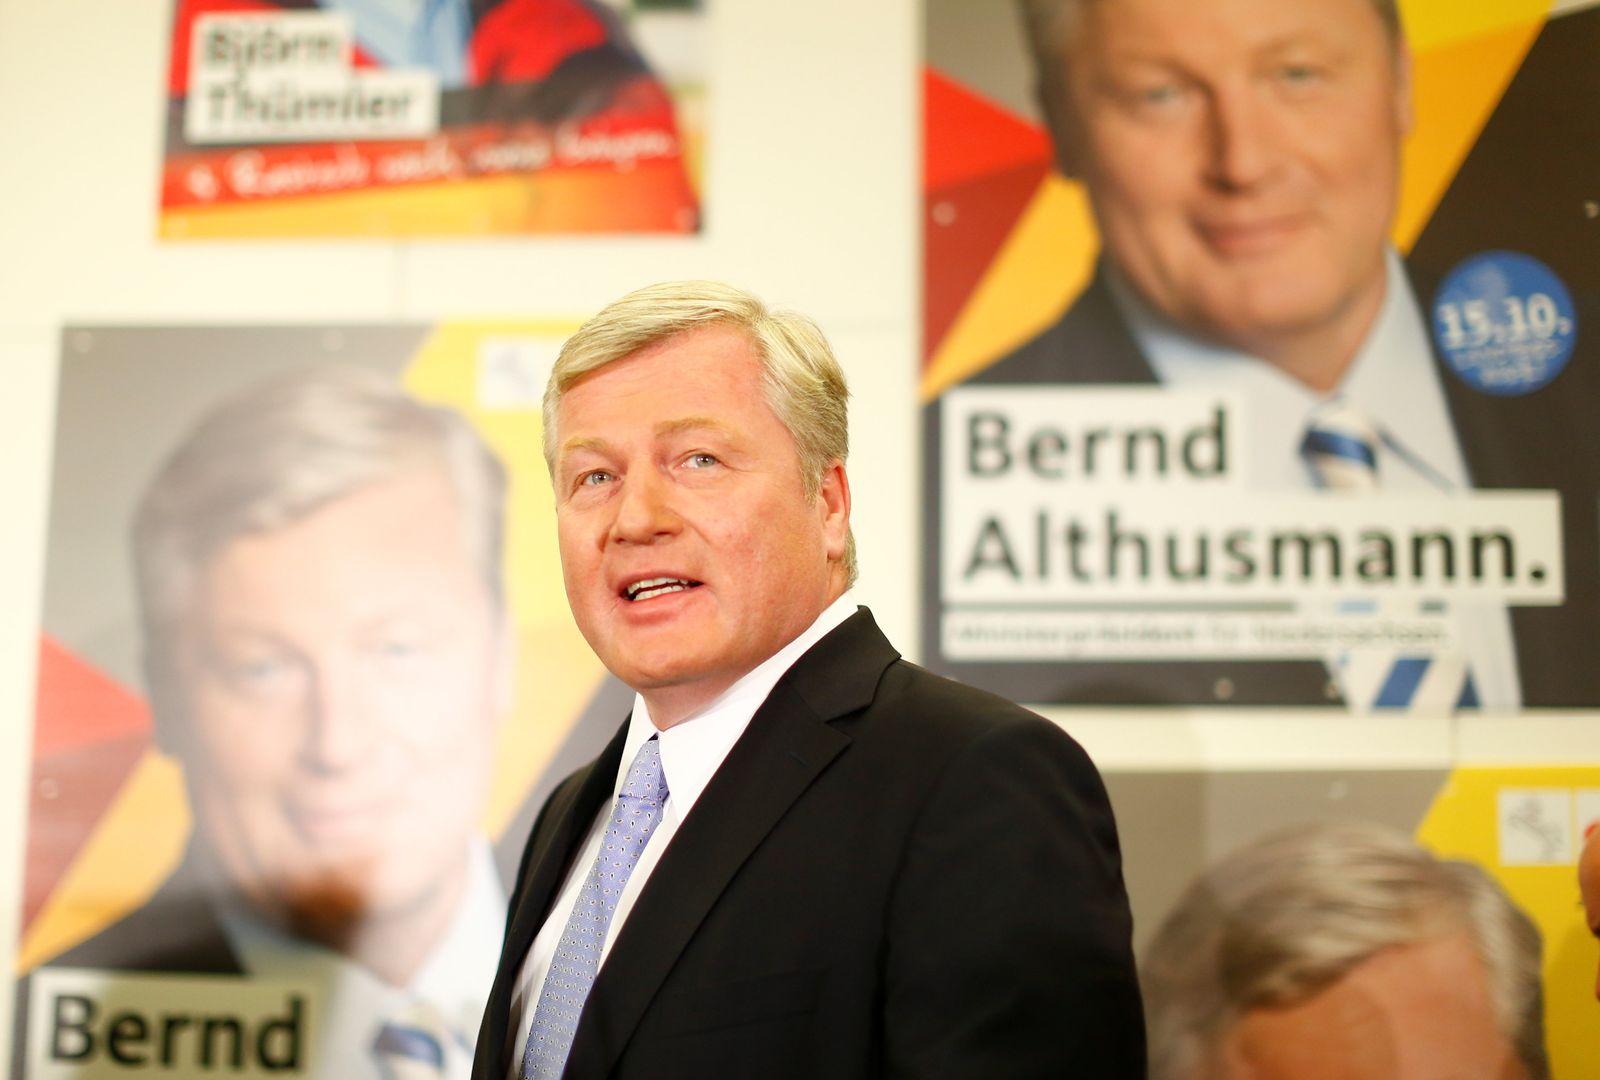 Landtagswahl Niedersachsen / Bernd Althusmann